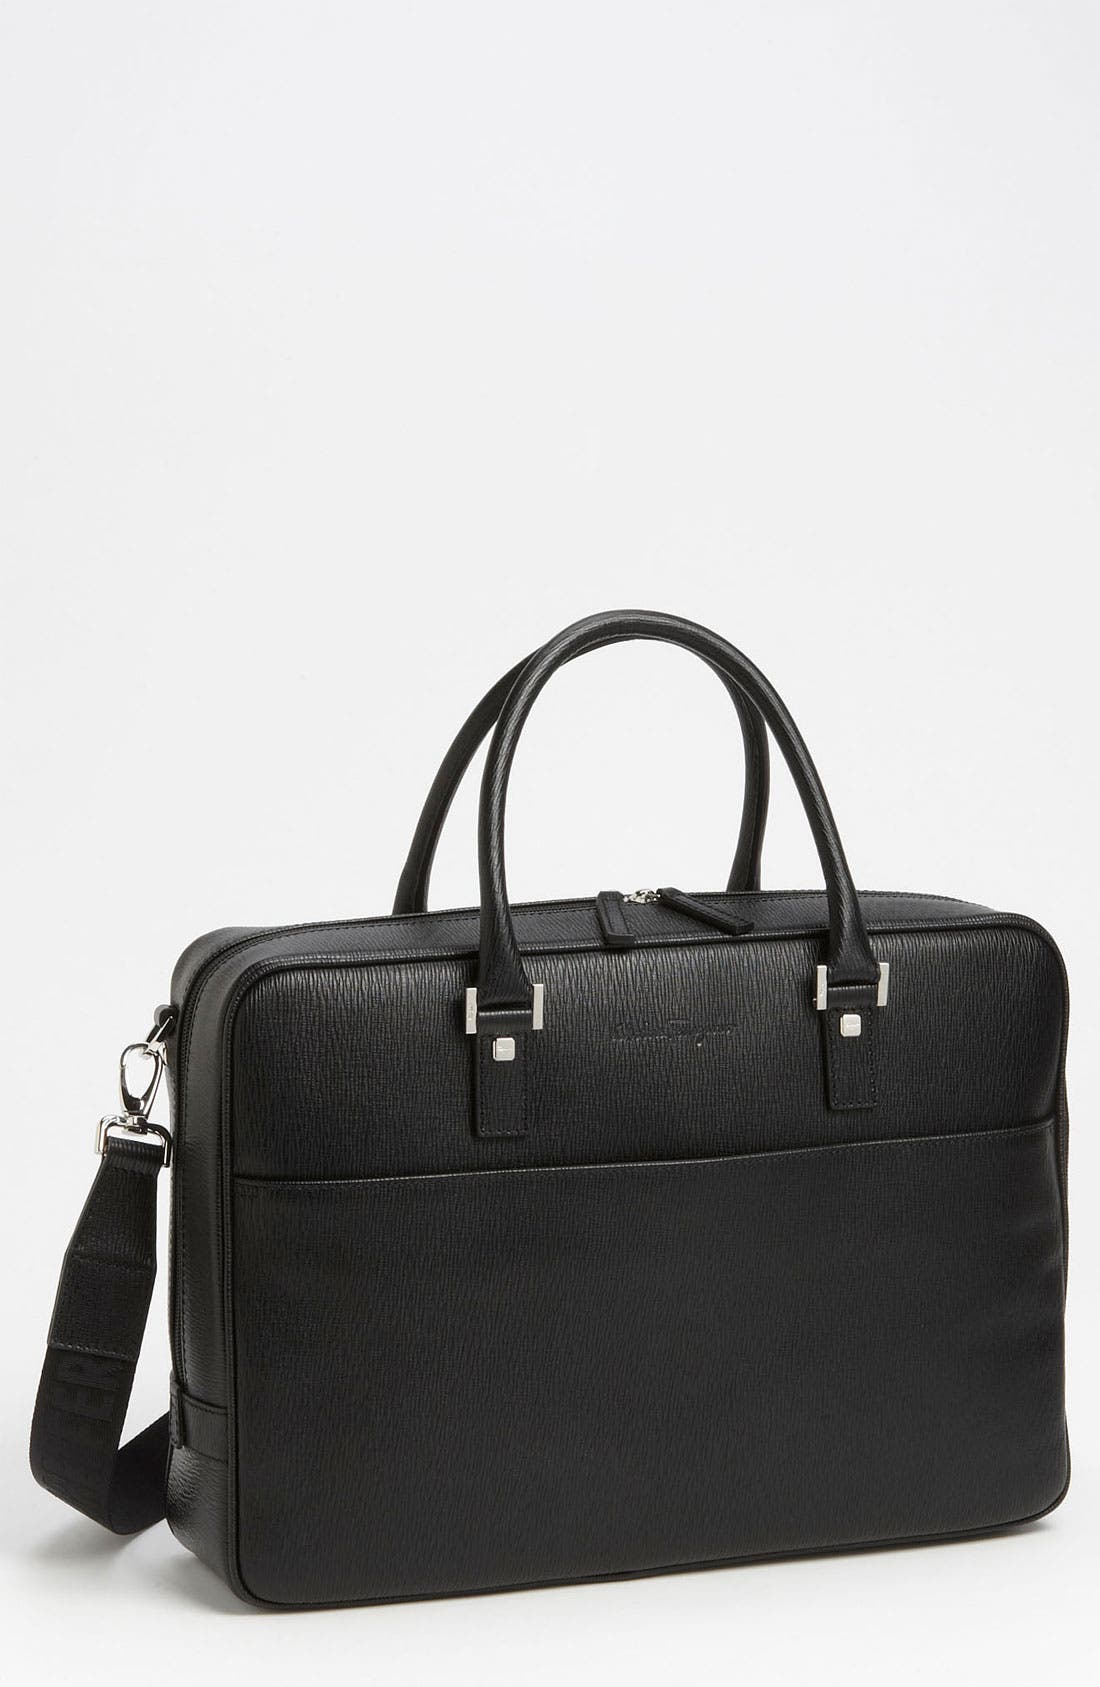 Salvatore Ferragamo Calfskin Briefcase